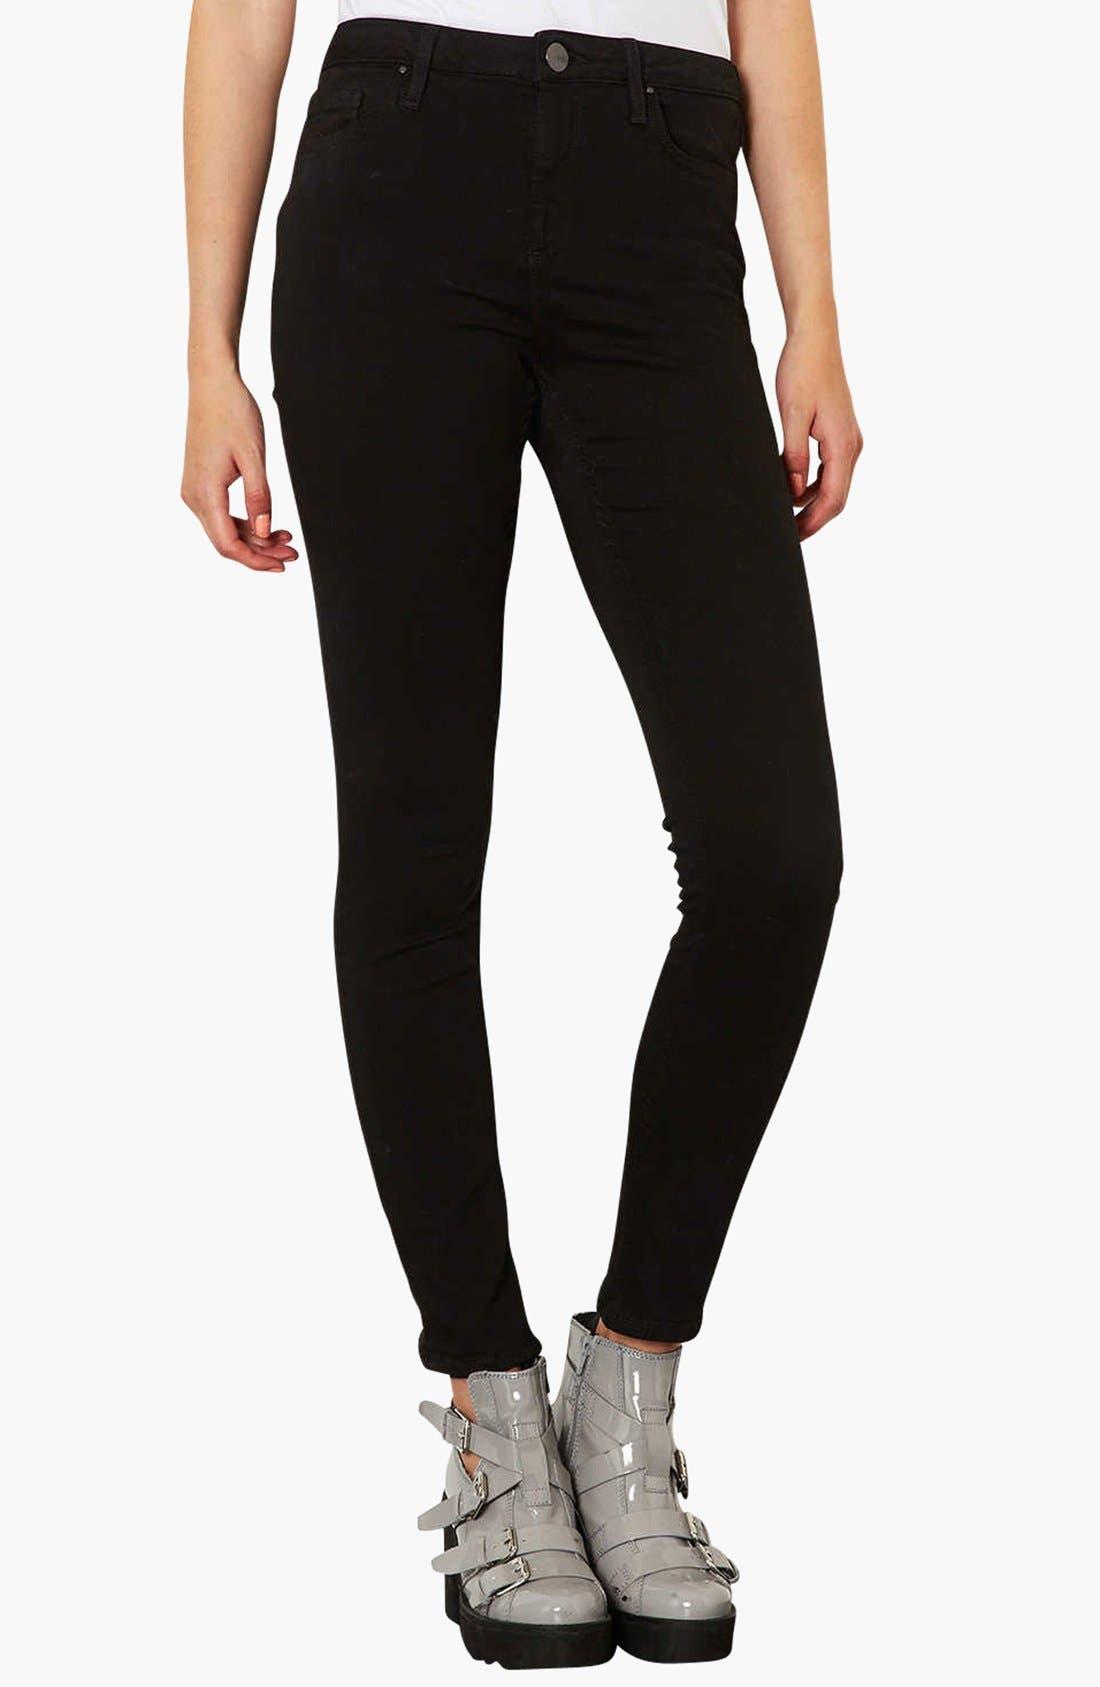 Alternate Image 1 Selected - Topshop Moto 'Jamie' High Rise Skinny Jeans (Regular, Short & Long)